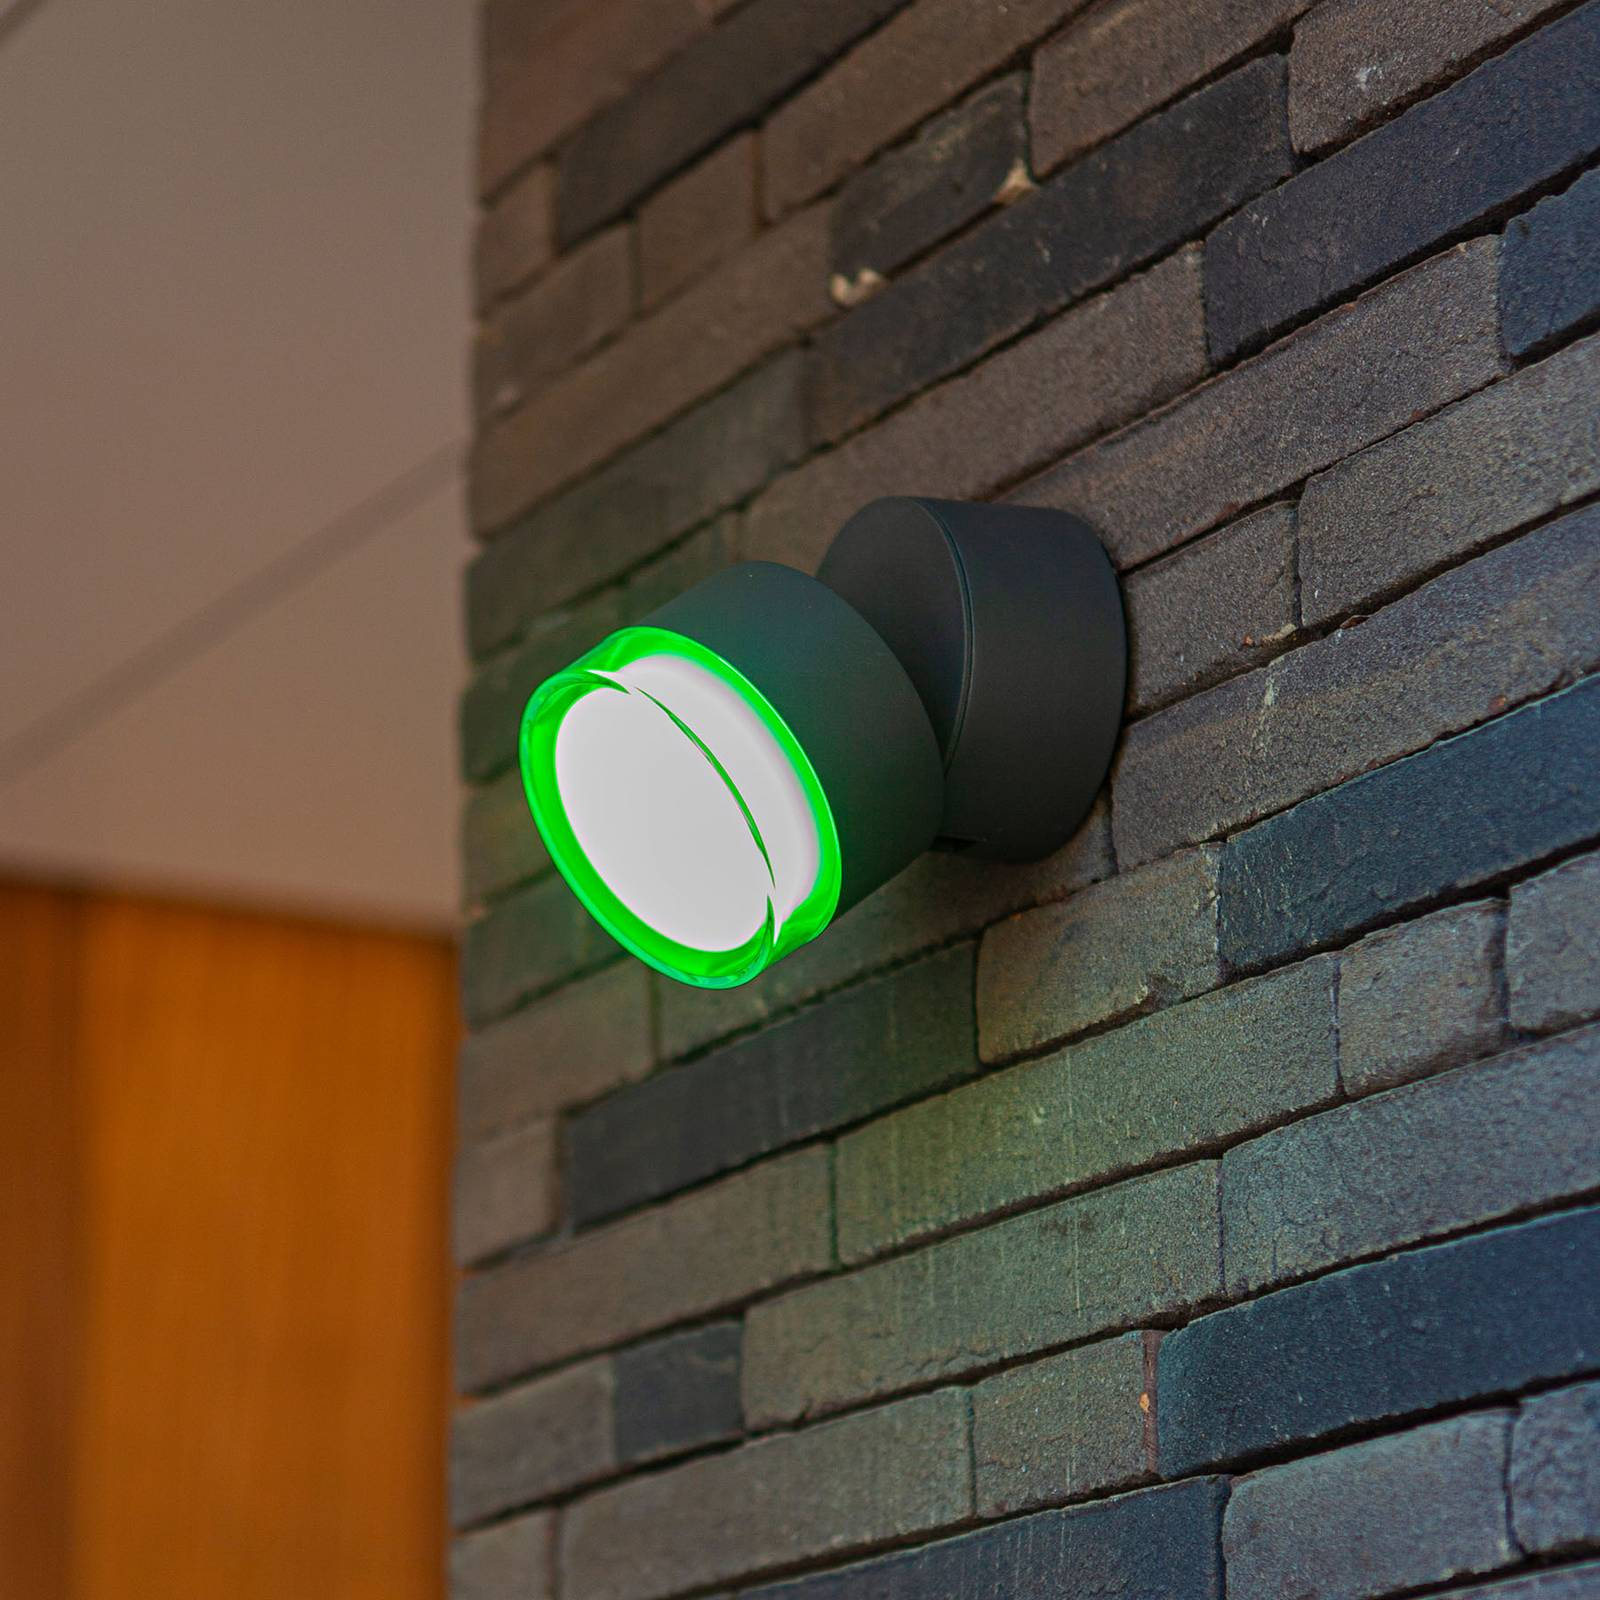 LED-ulkoseinälamppu Dropsi, RGBW, älykäs ohjaus